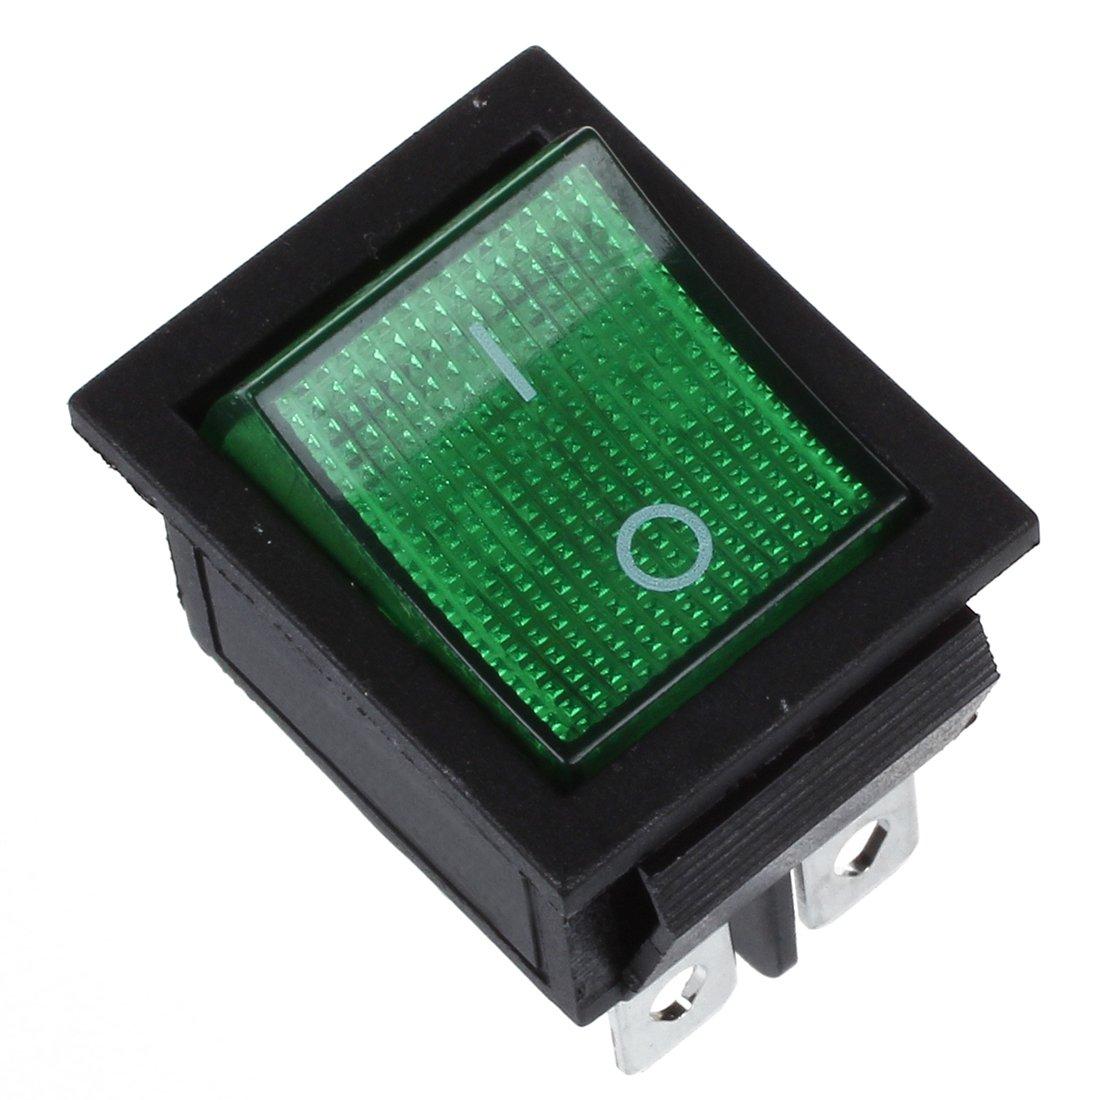 SODIAL(R) Green Light 4 Pin DPST ON/OFF Snap in Boat Rocker Switch 16A/250V 15A/125V AC